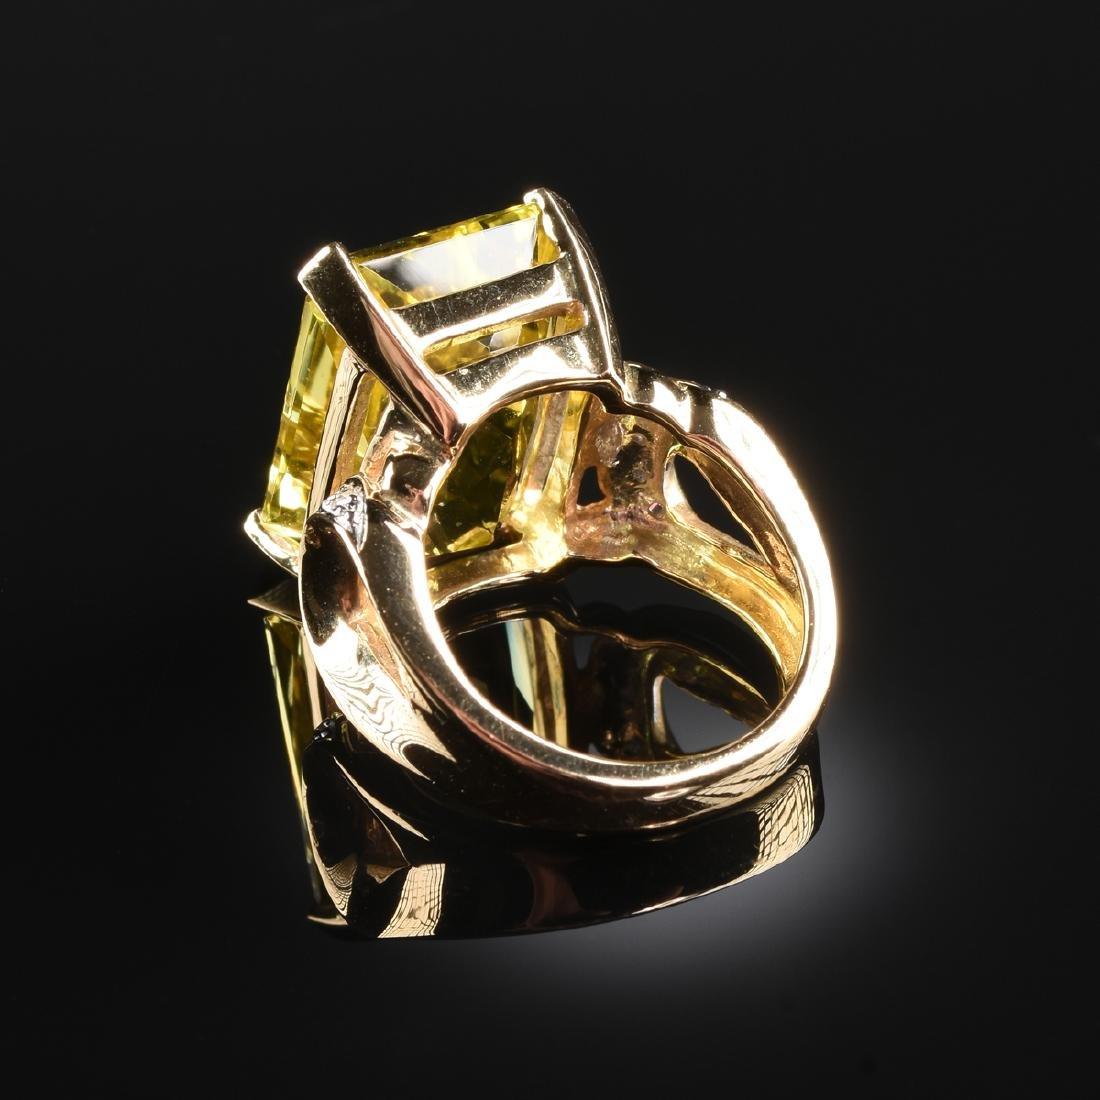 A 14K YELLOW GOLD, DIAMOND, AND YELLOW SAPPHIRE LAURA - 2